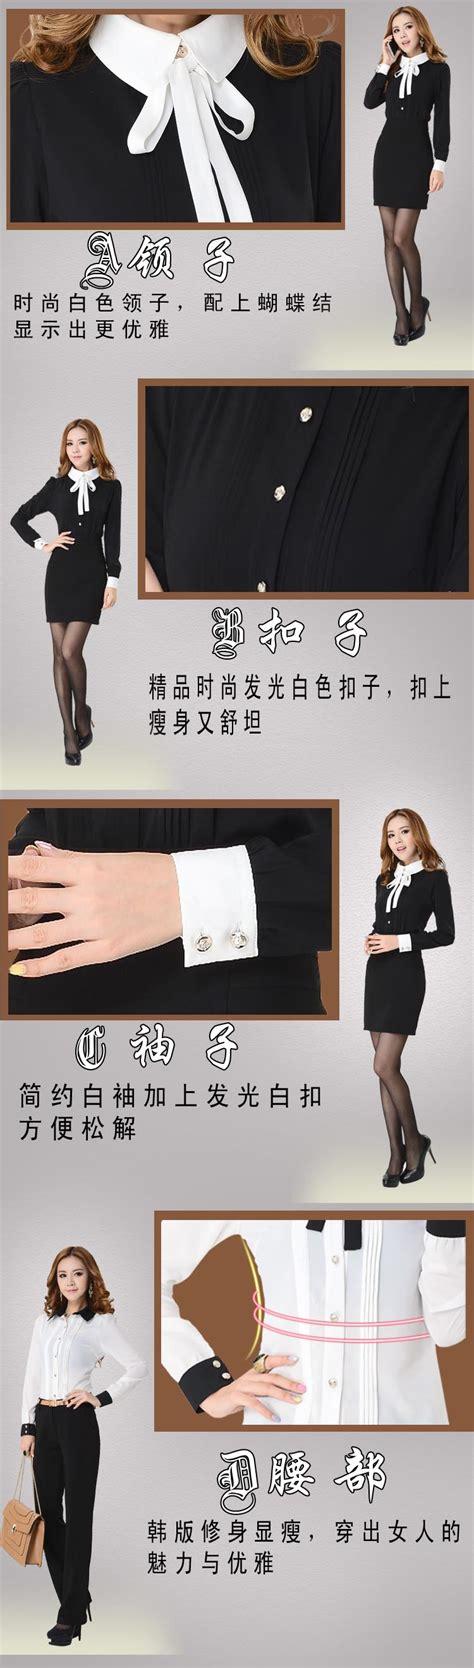 Baju Blouse Kaos Asimetris Korea Jepang Import Supplier Ready Stock 404 not found